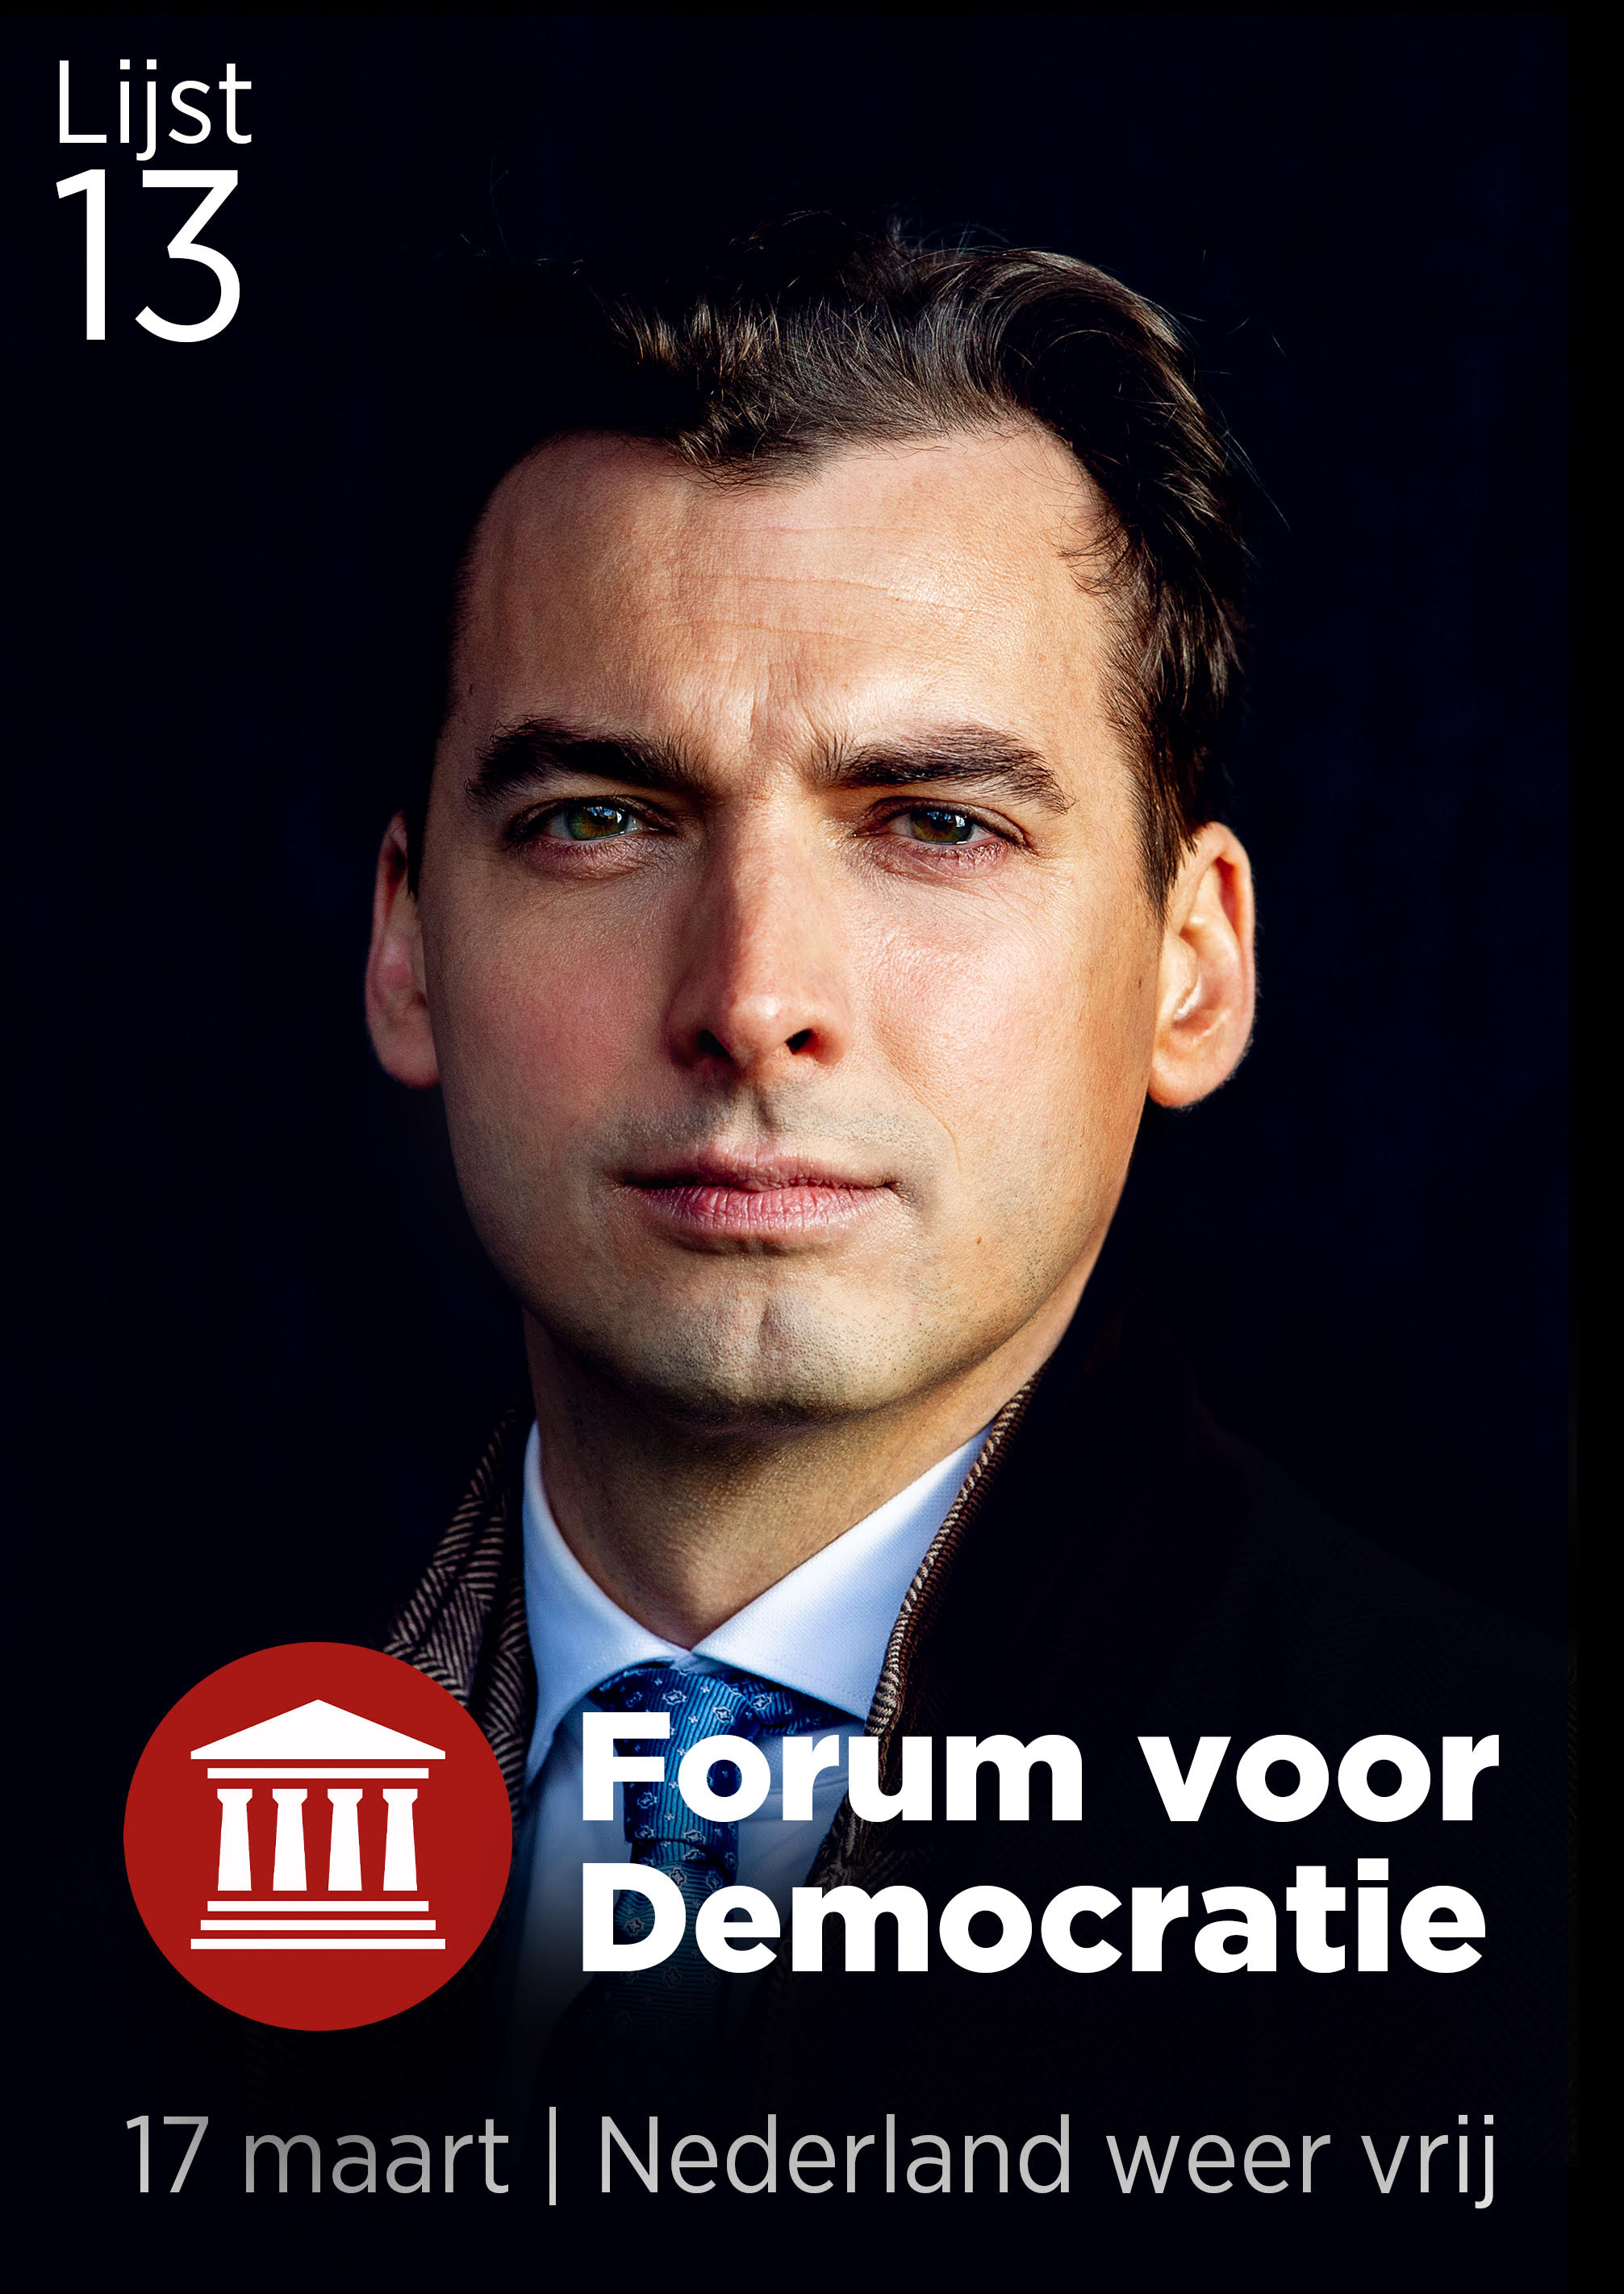 Poster stem Thierry Lijst 13